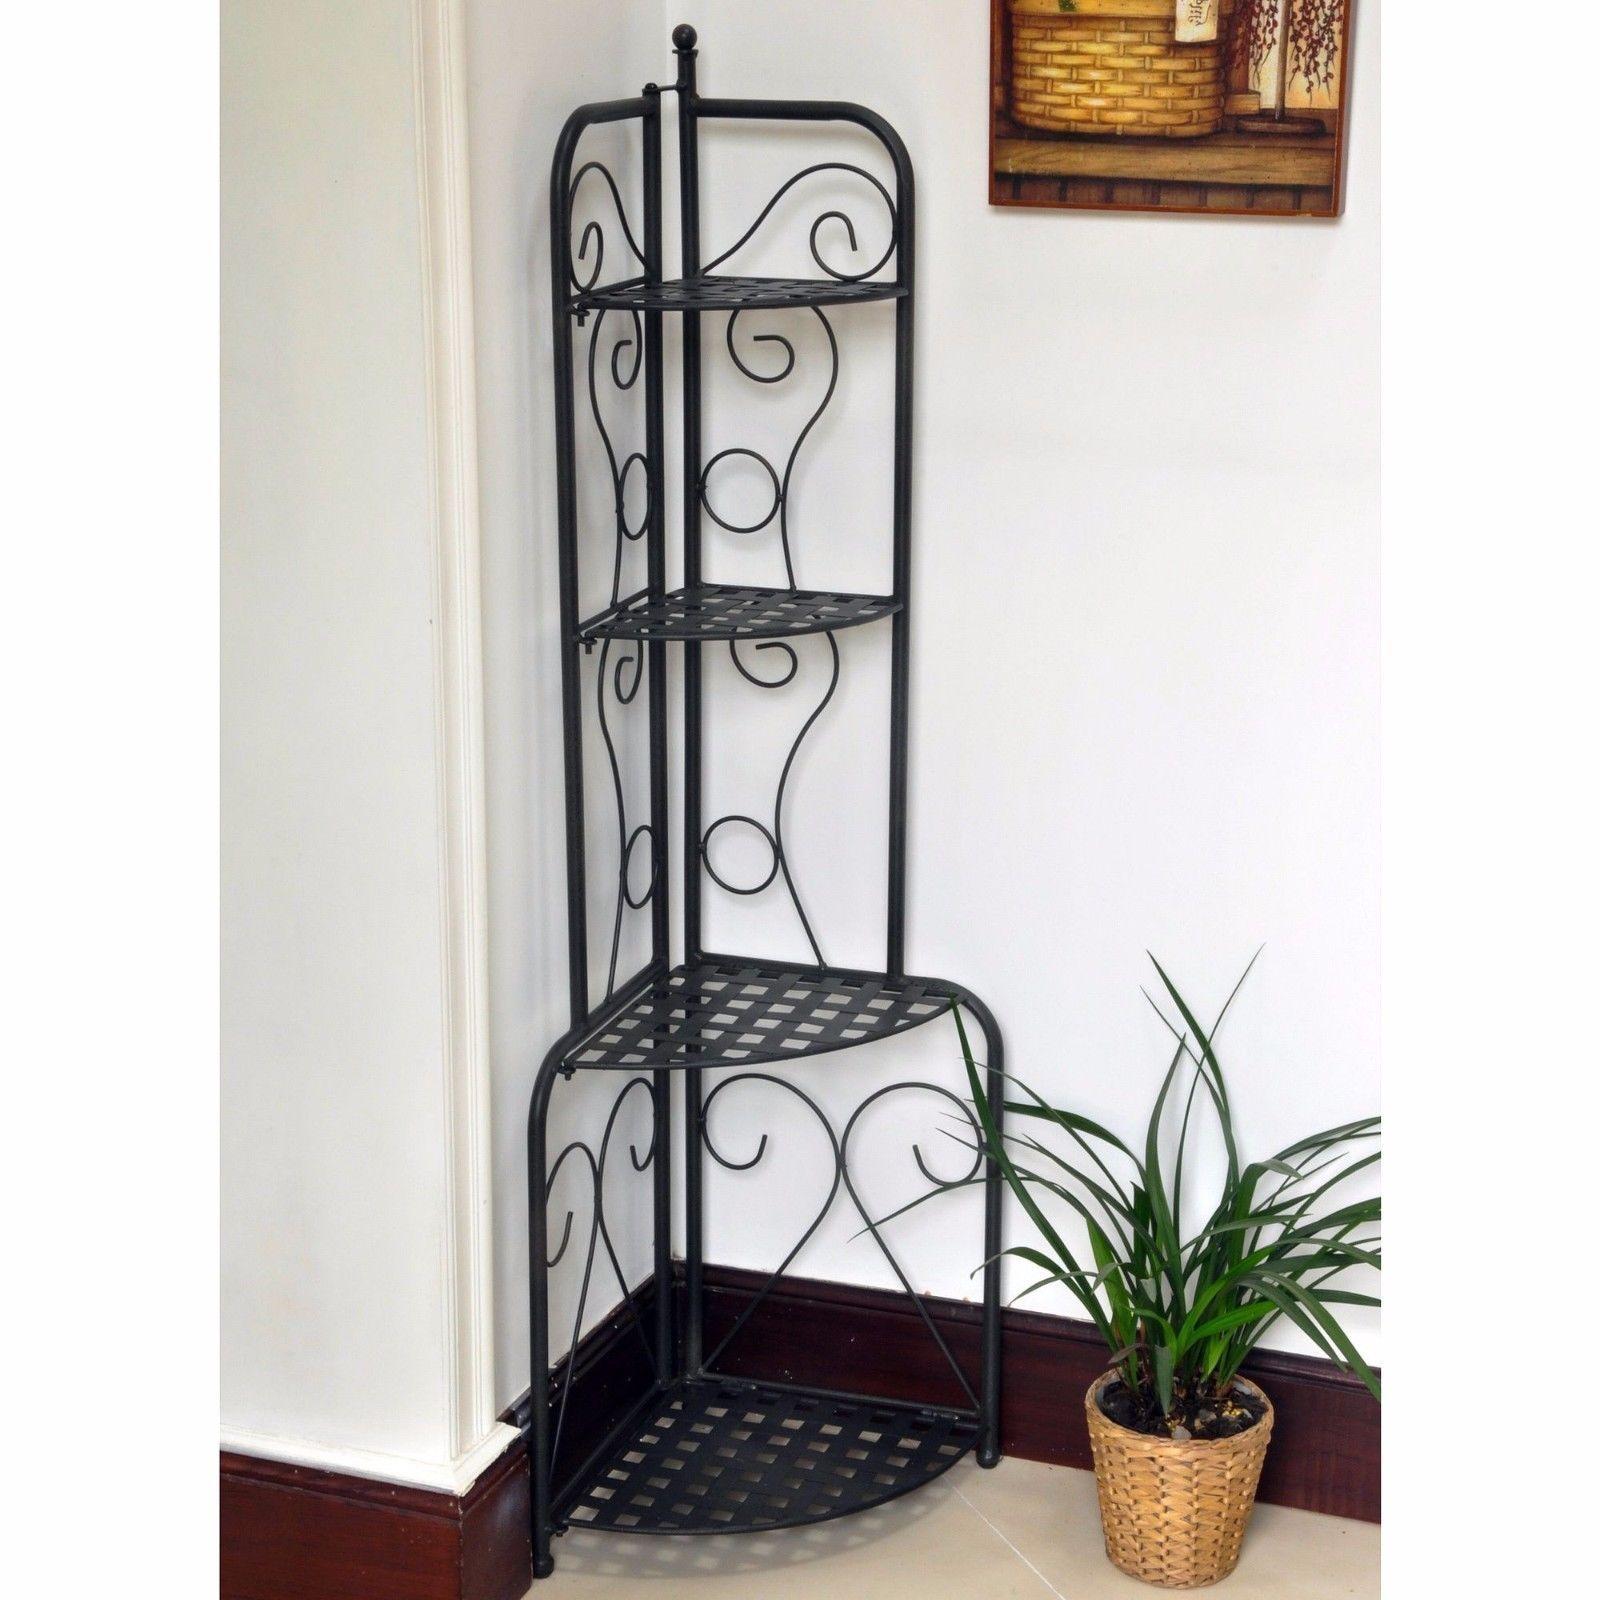 Wrought Iron Corner Shelf Black Folding In X2f Outdoor 4 Tier Unit Stand Plant Rackonly 2 In Stock Order Today Product Desc Corner Shelves Shelves Home Decor